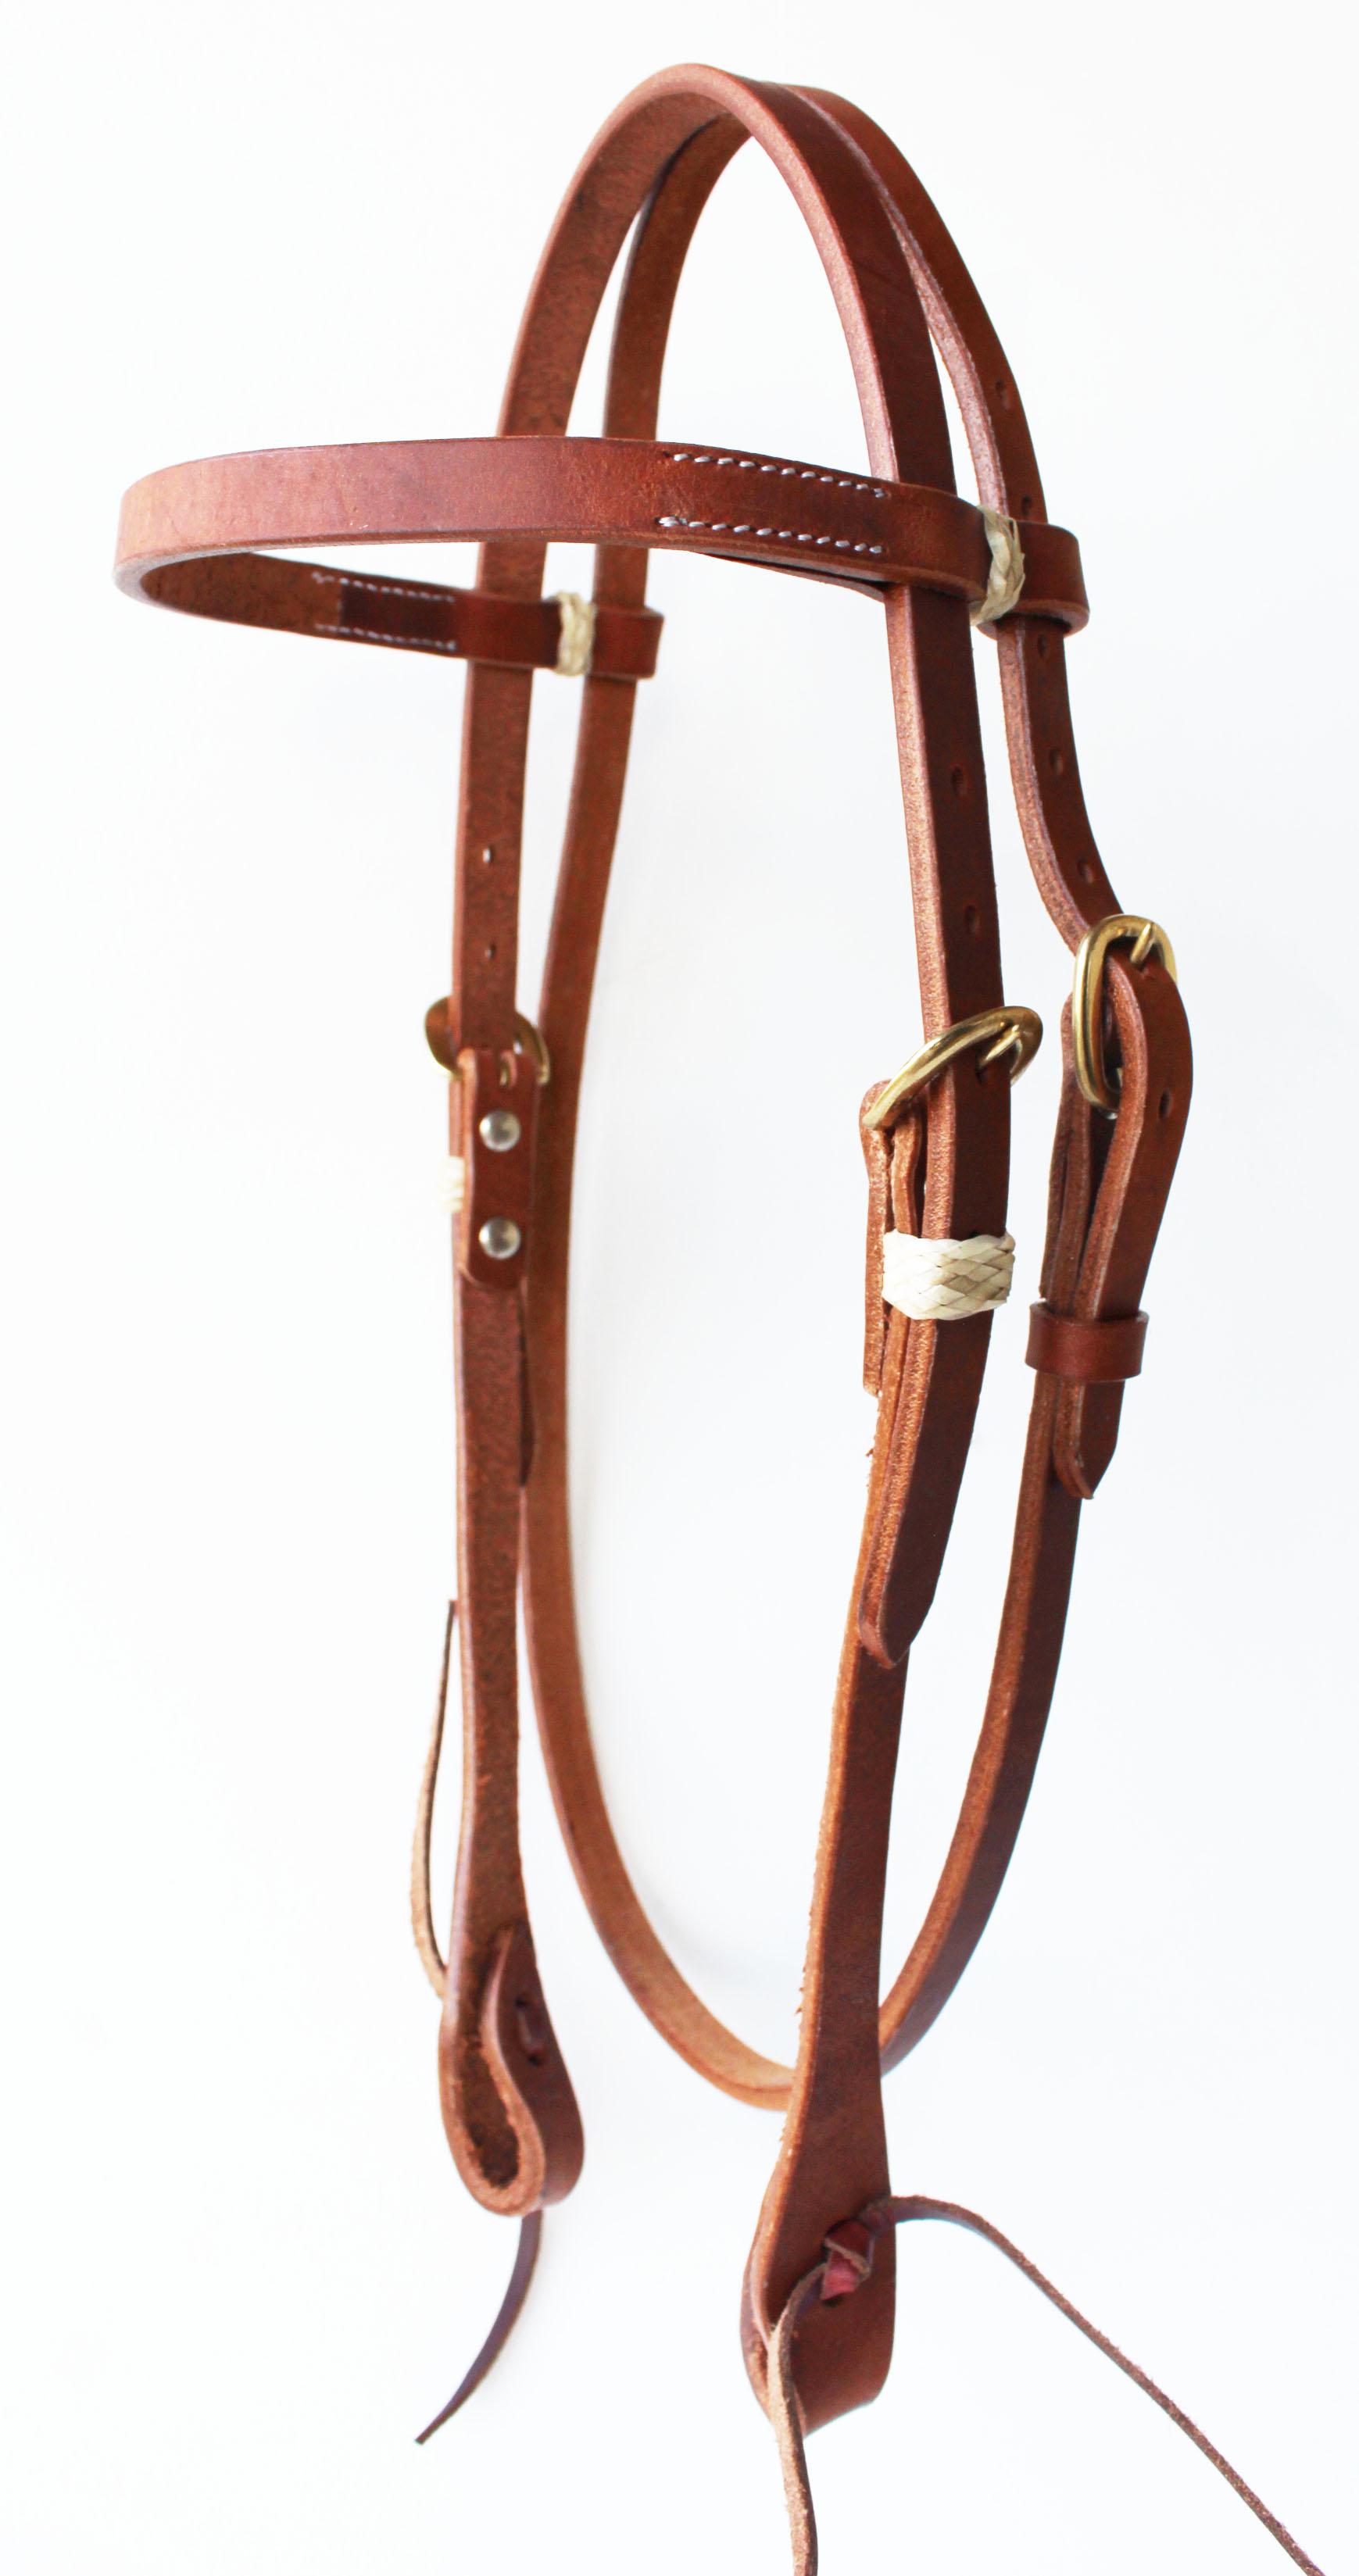 Amish Made Usa Leather Horse Saddle Western Headstall Bridle Tack Brass 78rt01 635778614298 Ebay